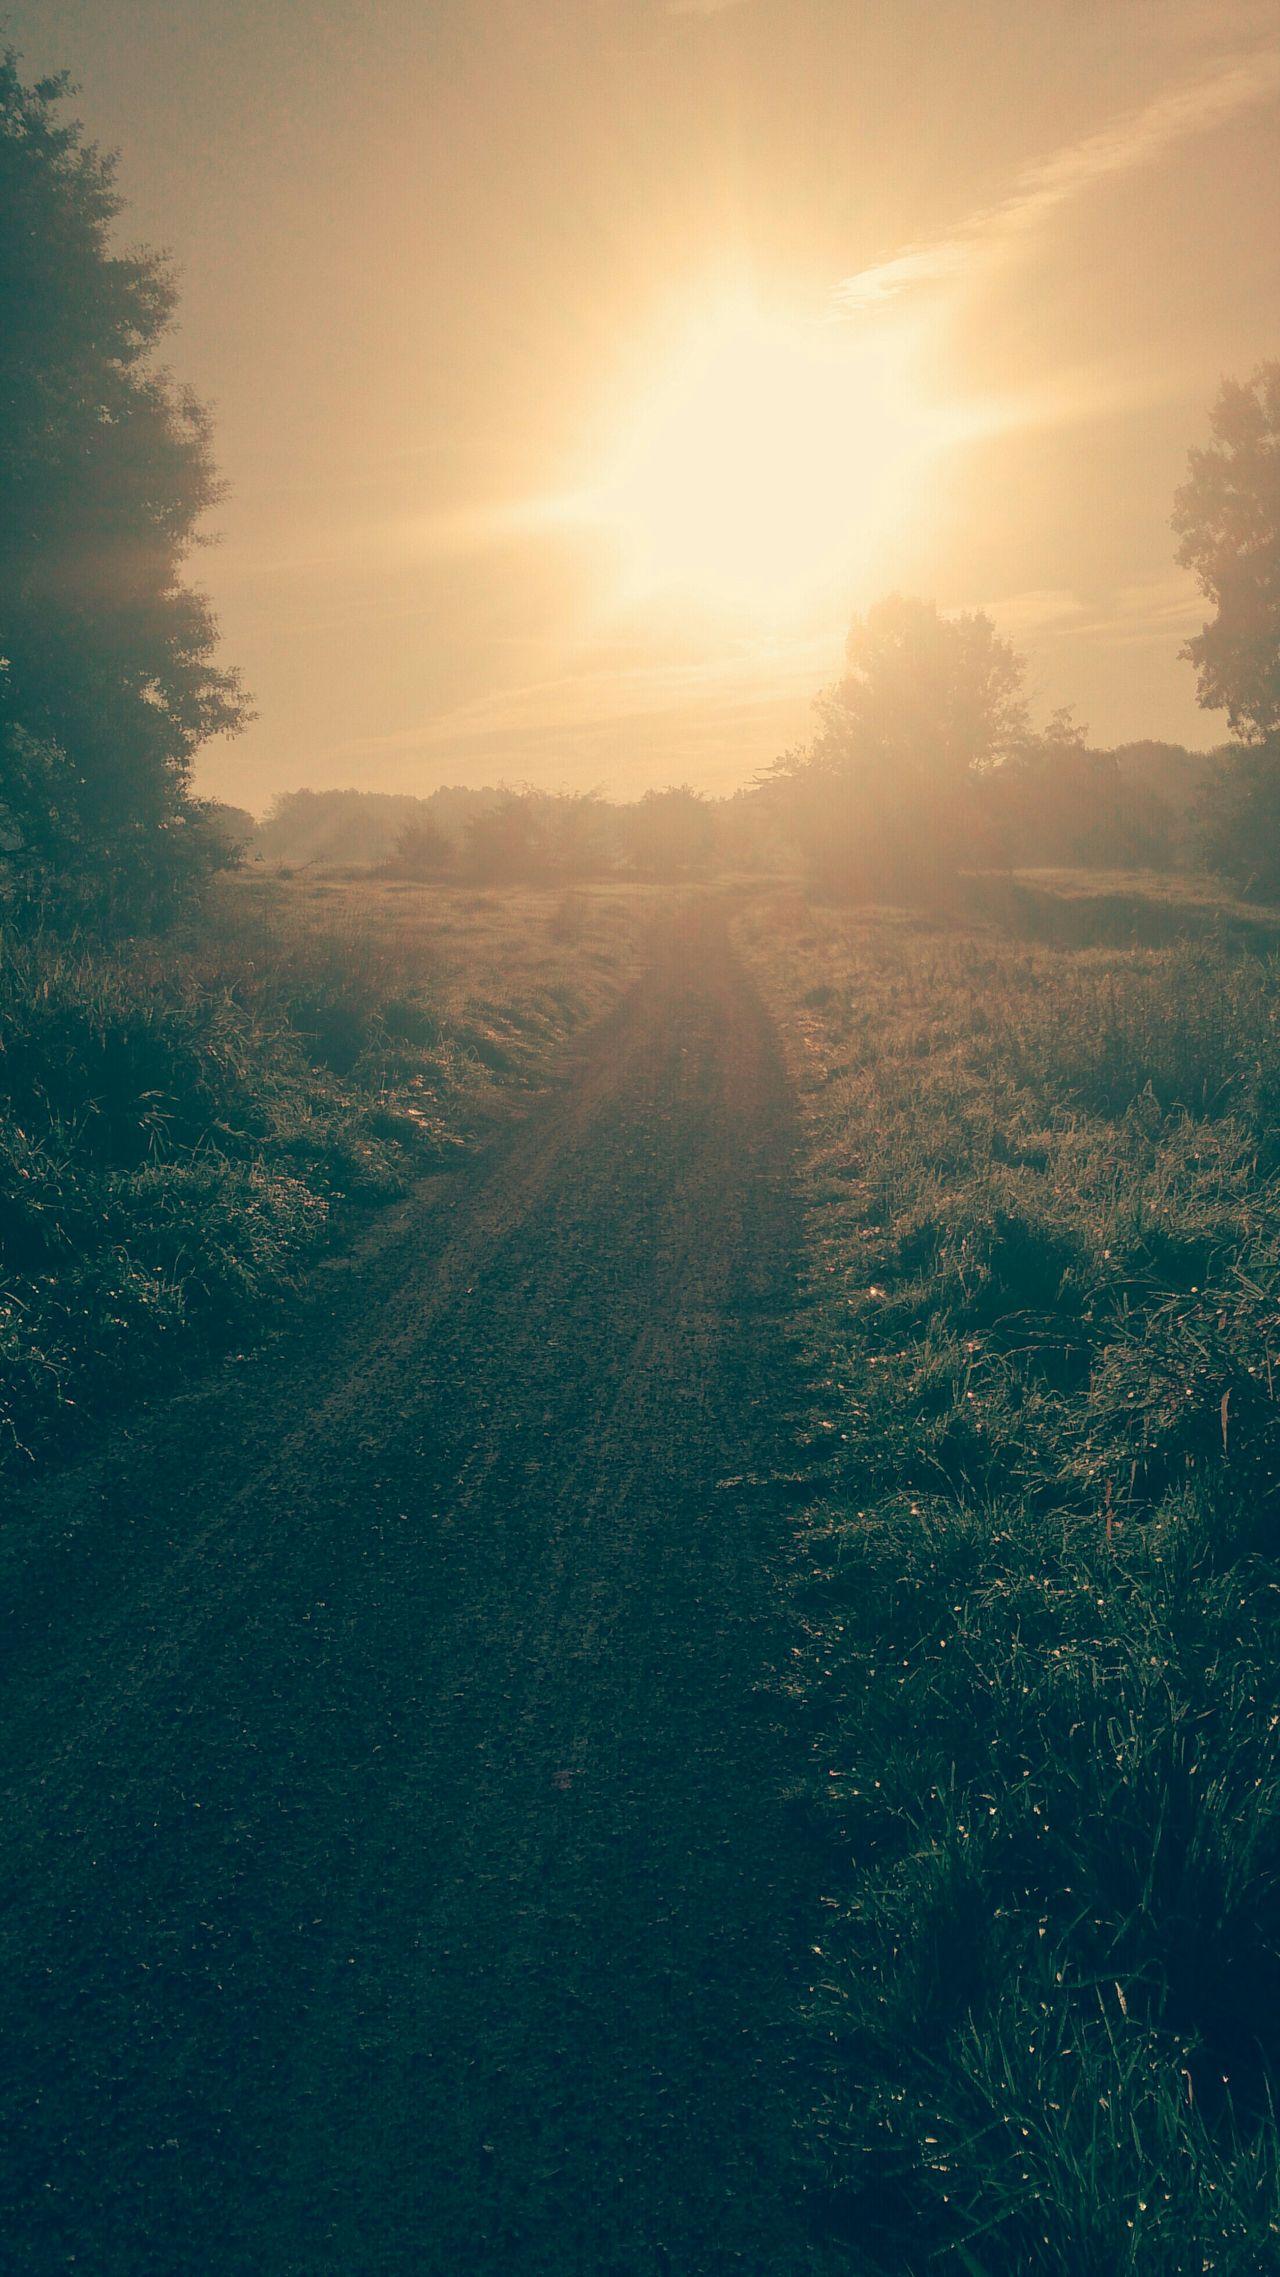 Morning Sunrise Beautiful Sunrise Sunray Amazing Sunrise Sunrise/Sunset Sunrise Wonderful Foggy Morning Enjoying The Sun Beautiful Day